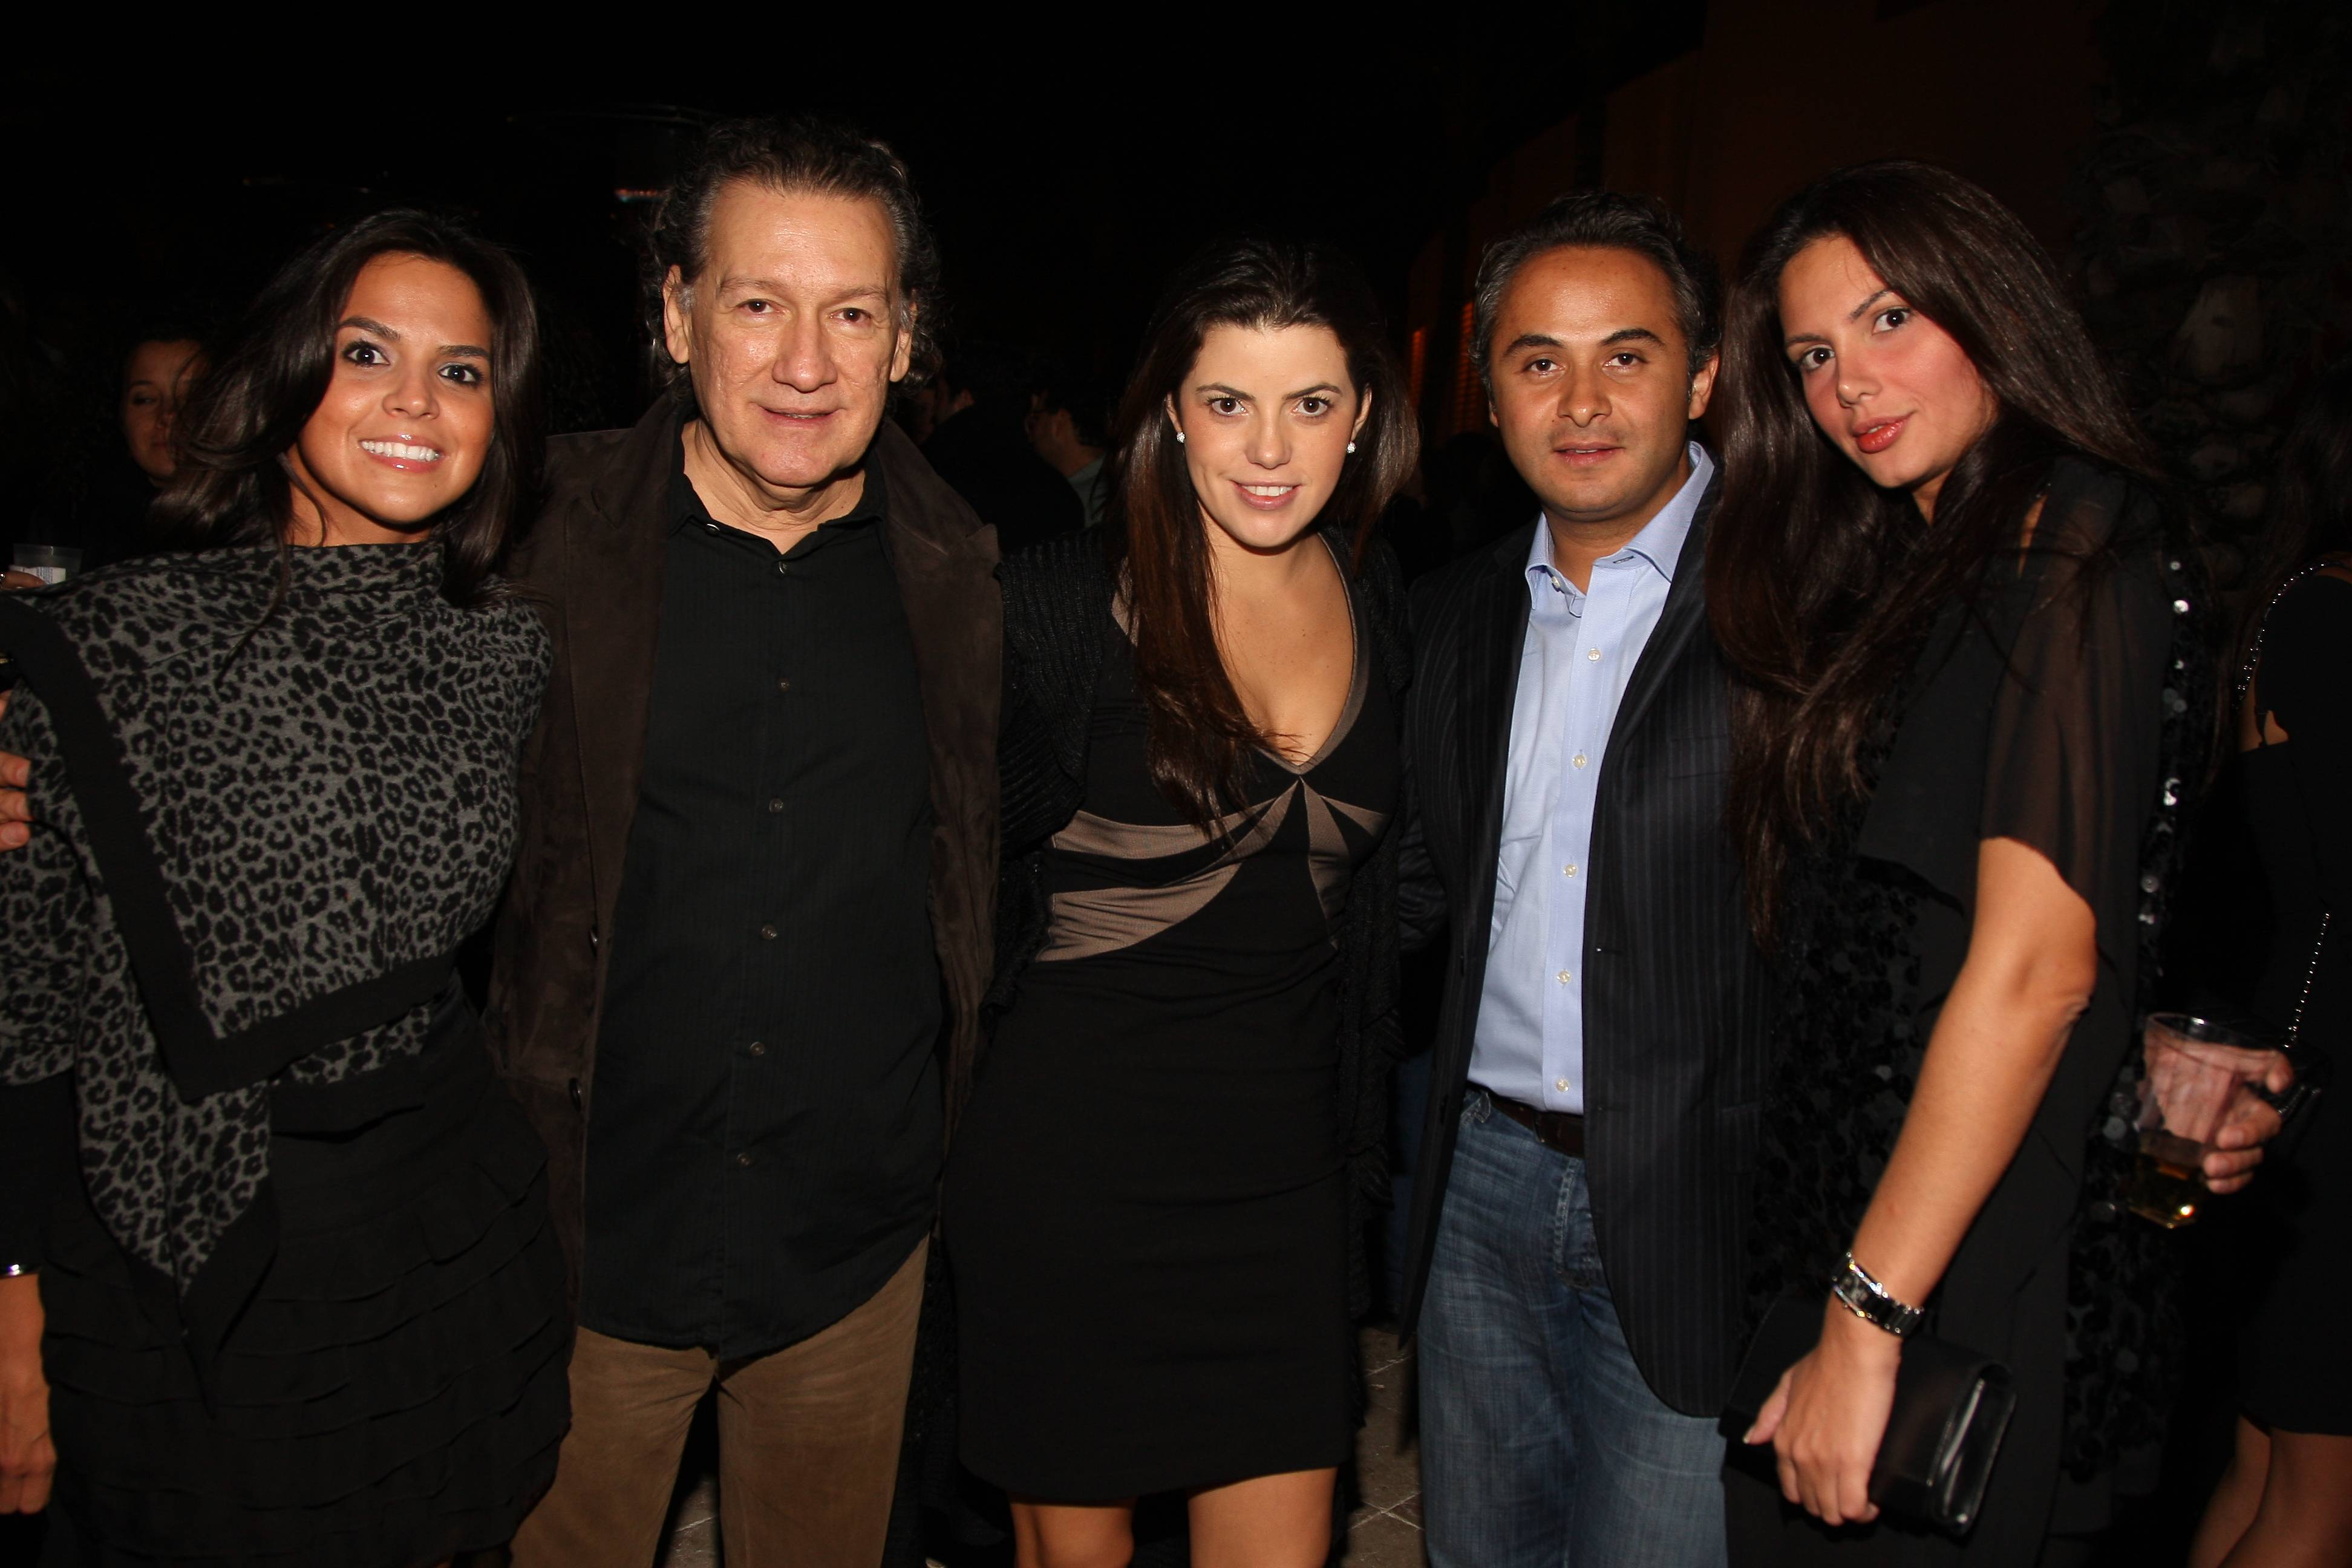 Sonia Guzman, Mario Telo, Ximena Penuela, Enrique Rubio, Barbara Romano